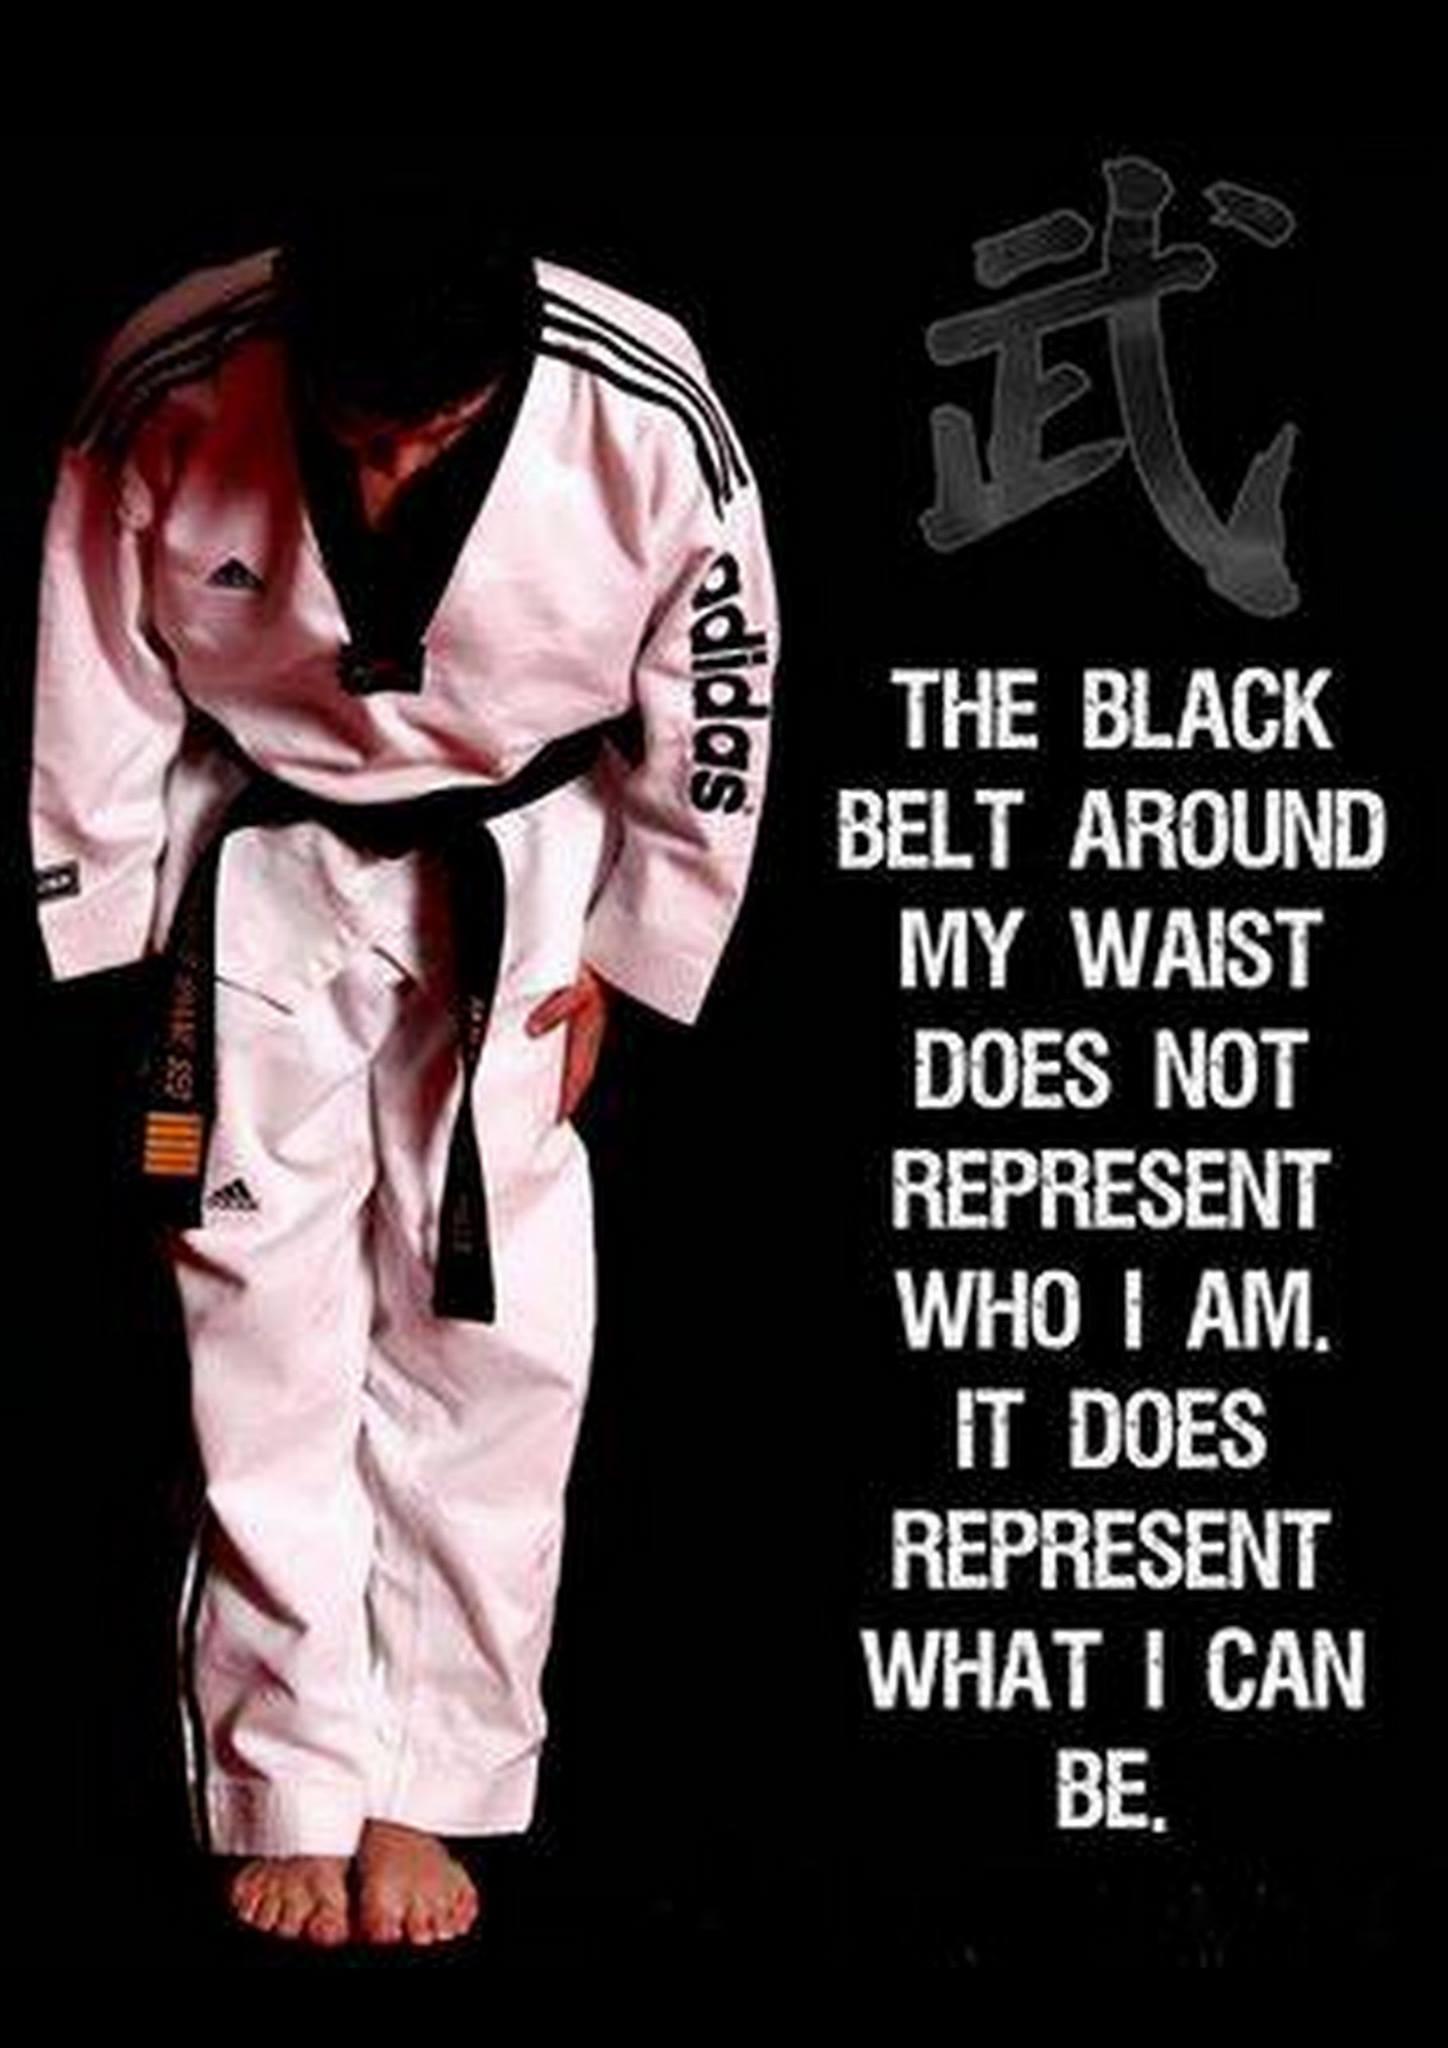 Taekwondo Quotes Quotes About Taekwondo 24 Quotes